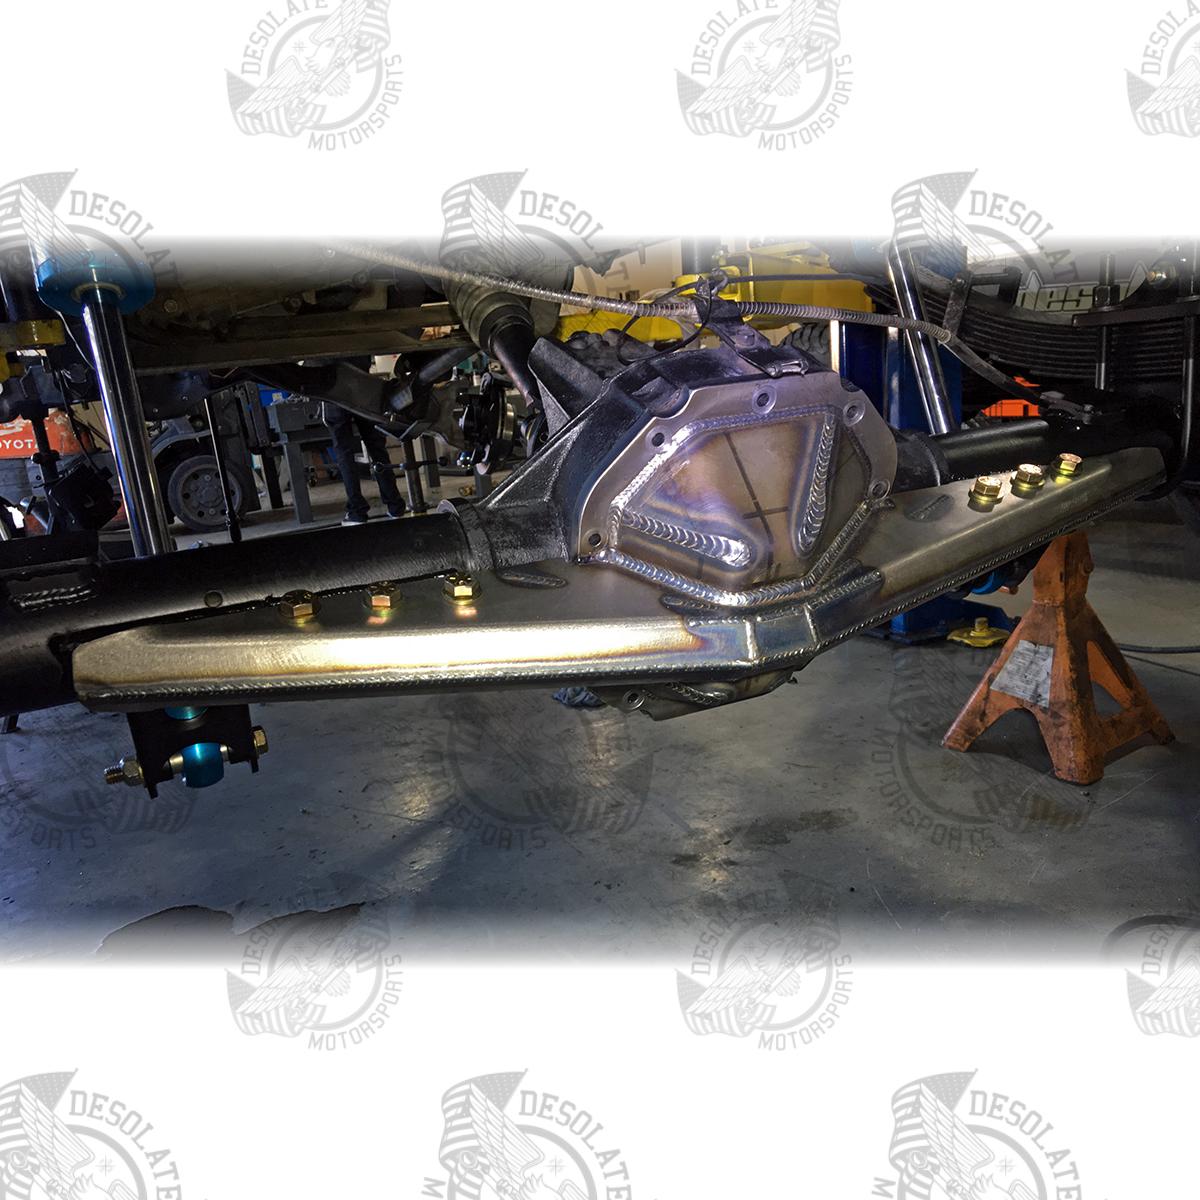 Desolate Motorsports Ford 8 8 Rear Axle Truss Desolate Motorsports